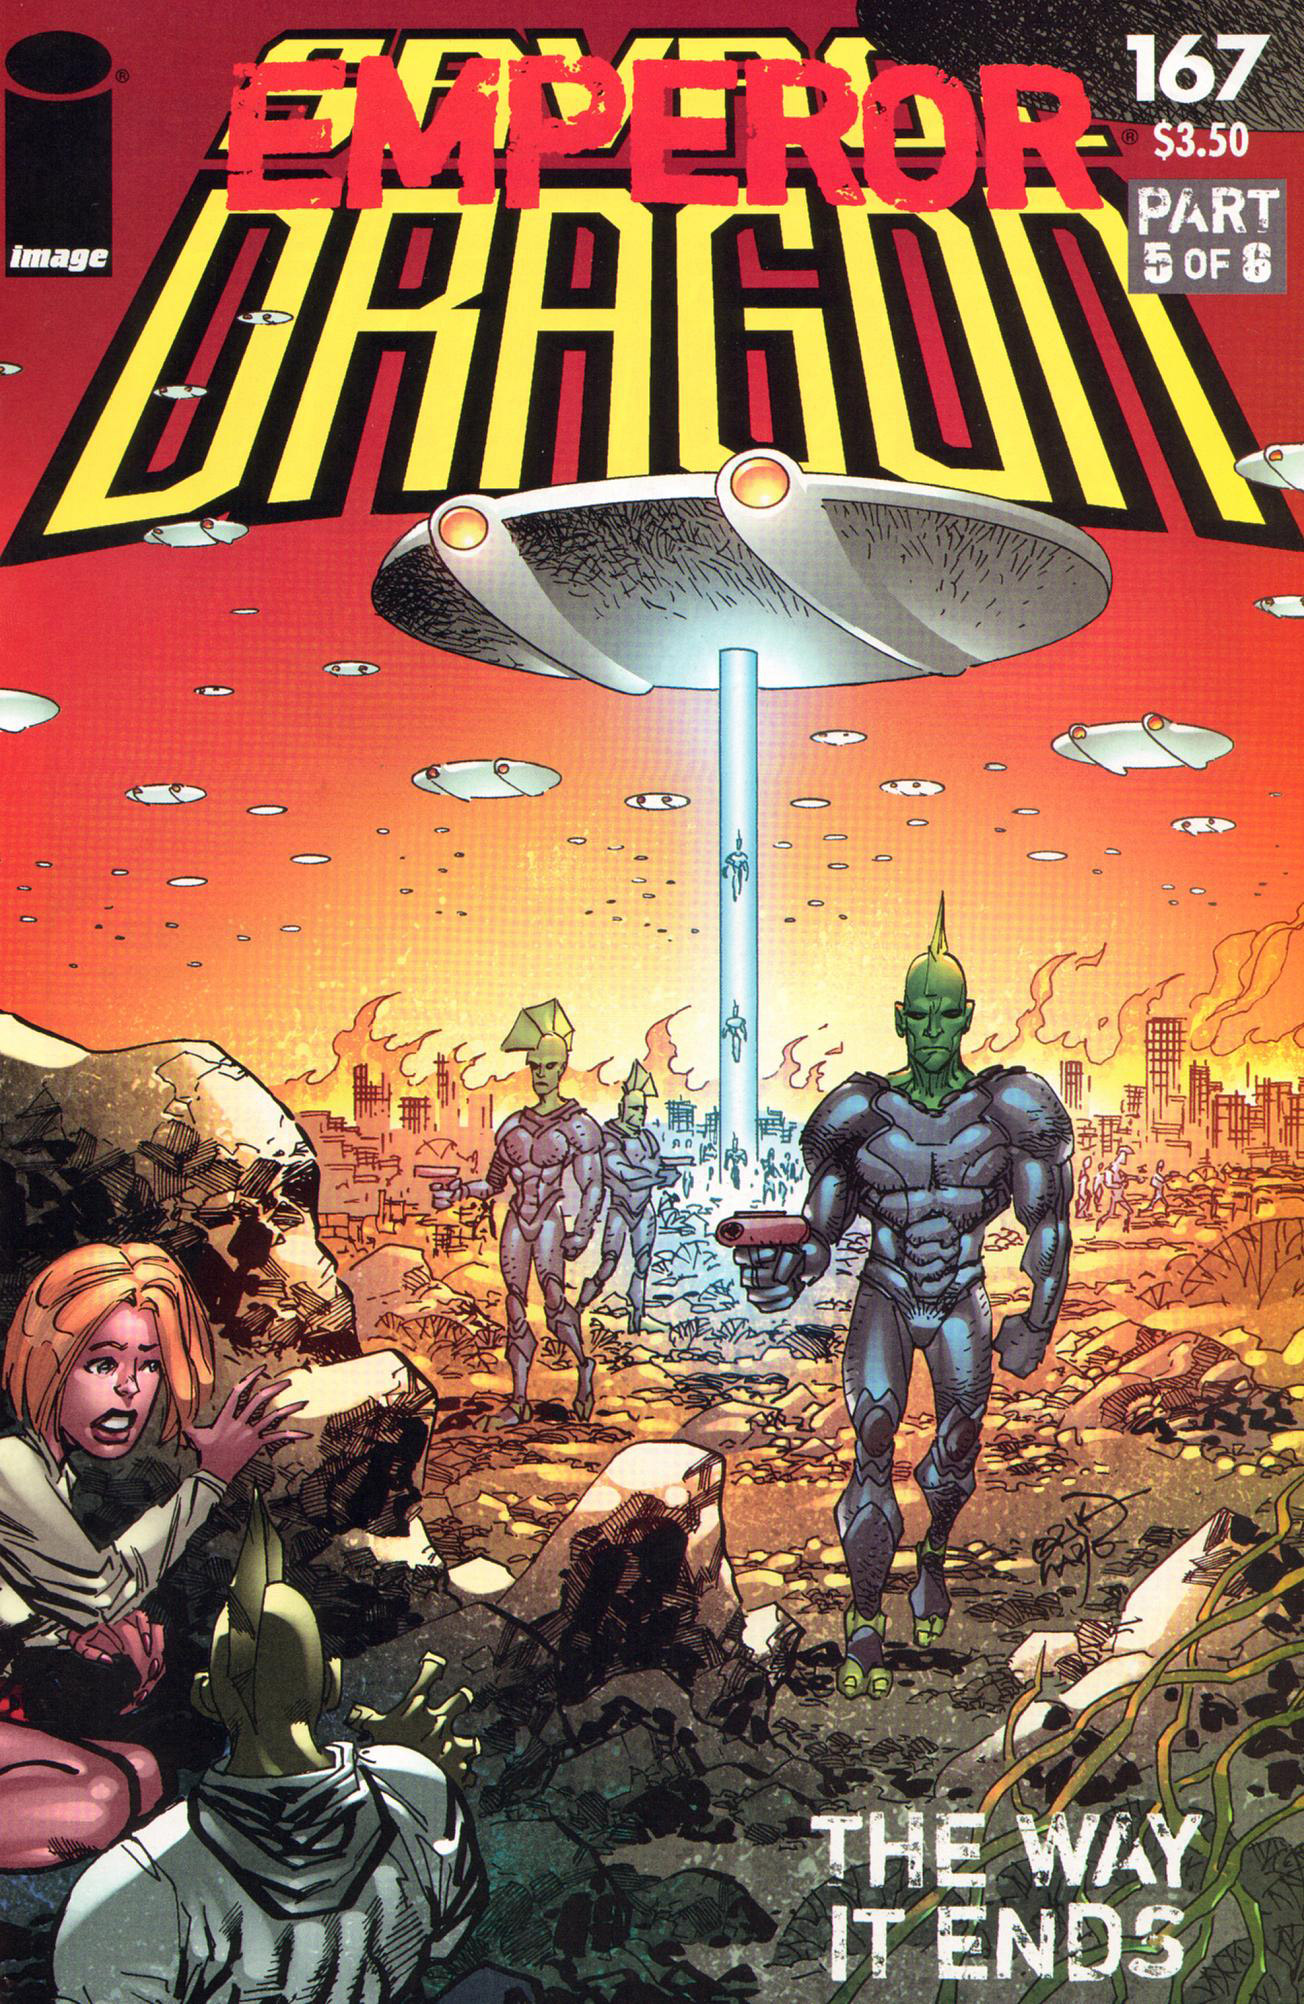 Cover Savage Dragon Vol.2 #167